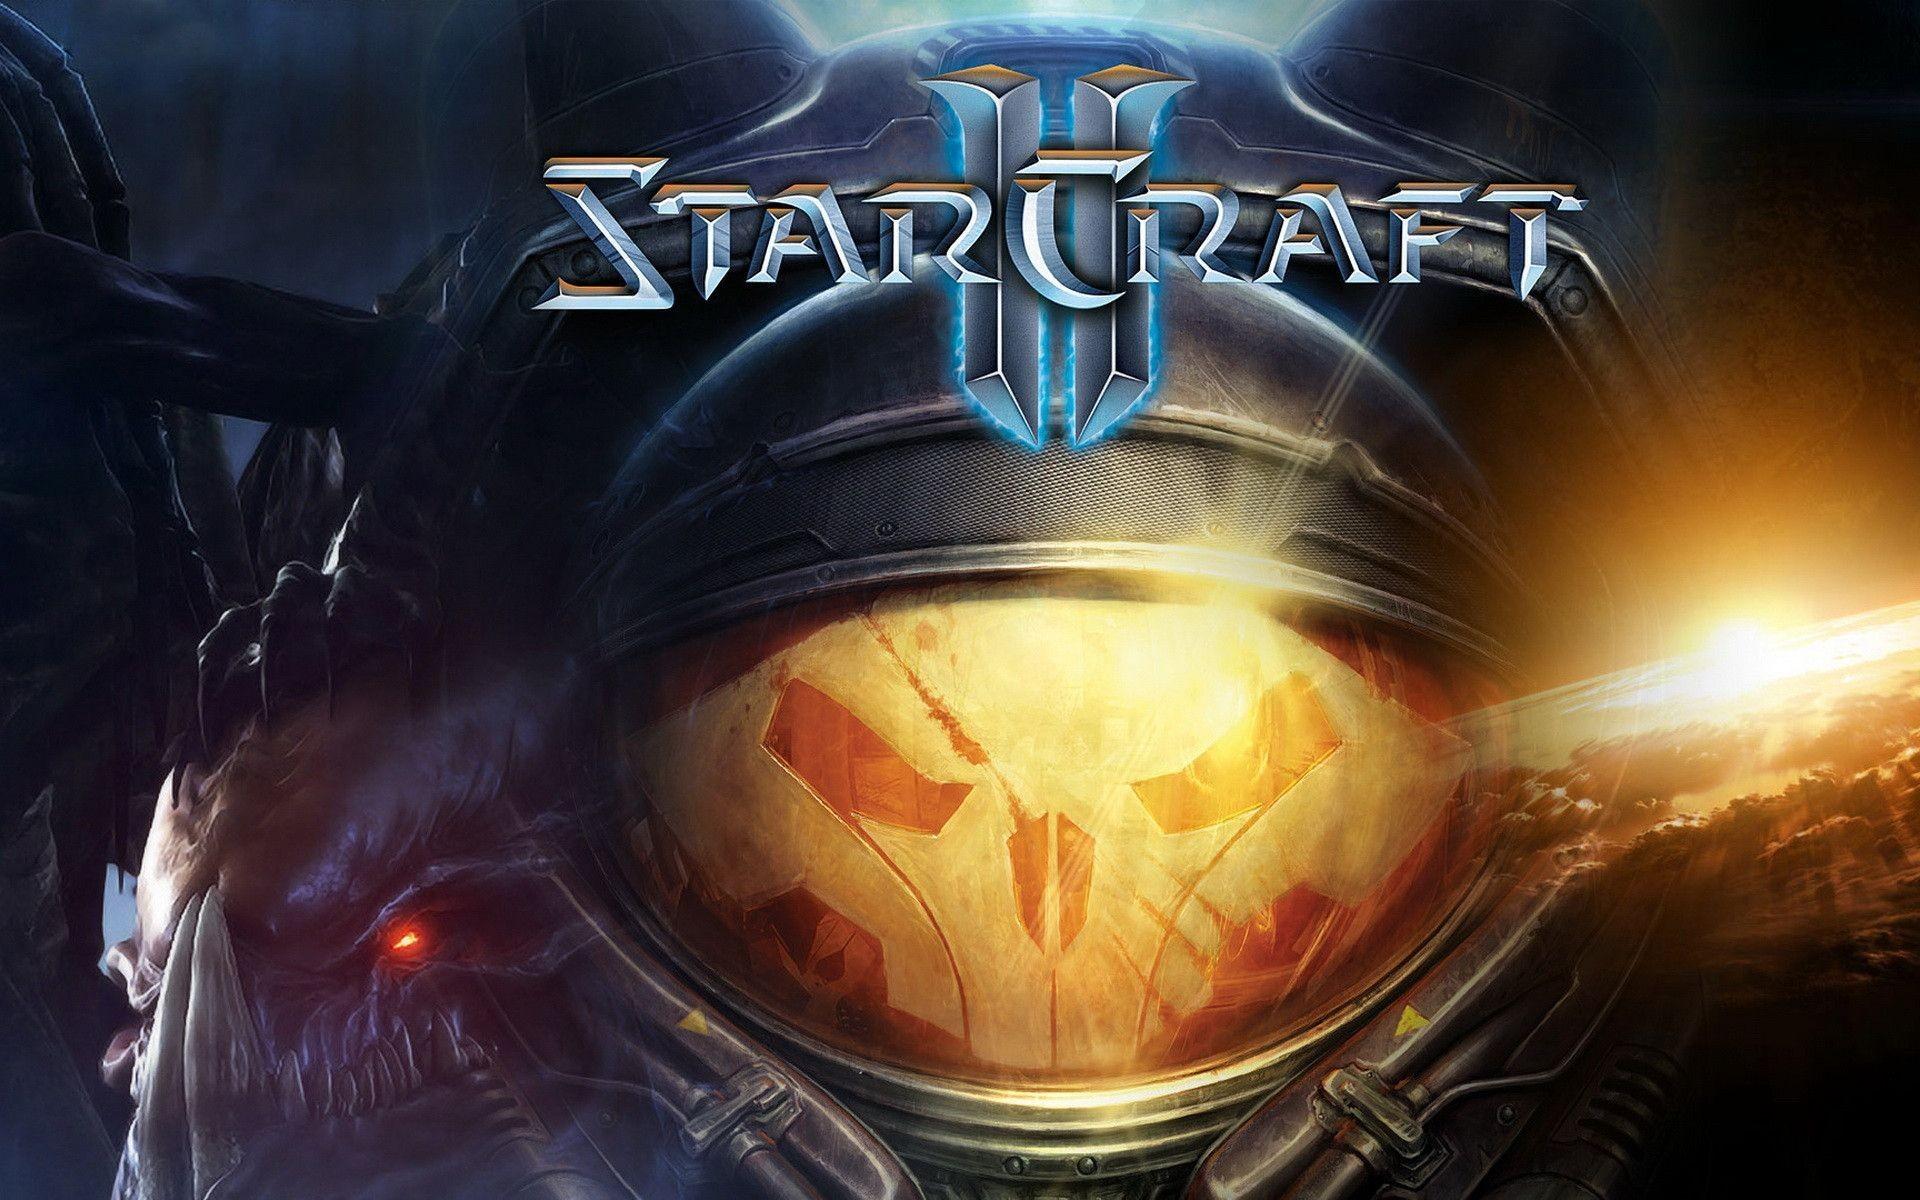 StarCraft 2 Wallpapers 1920×1080 – Wallpaper Cave